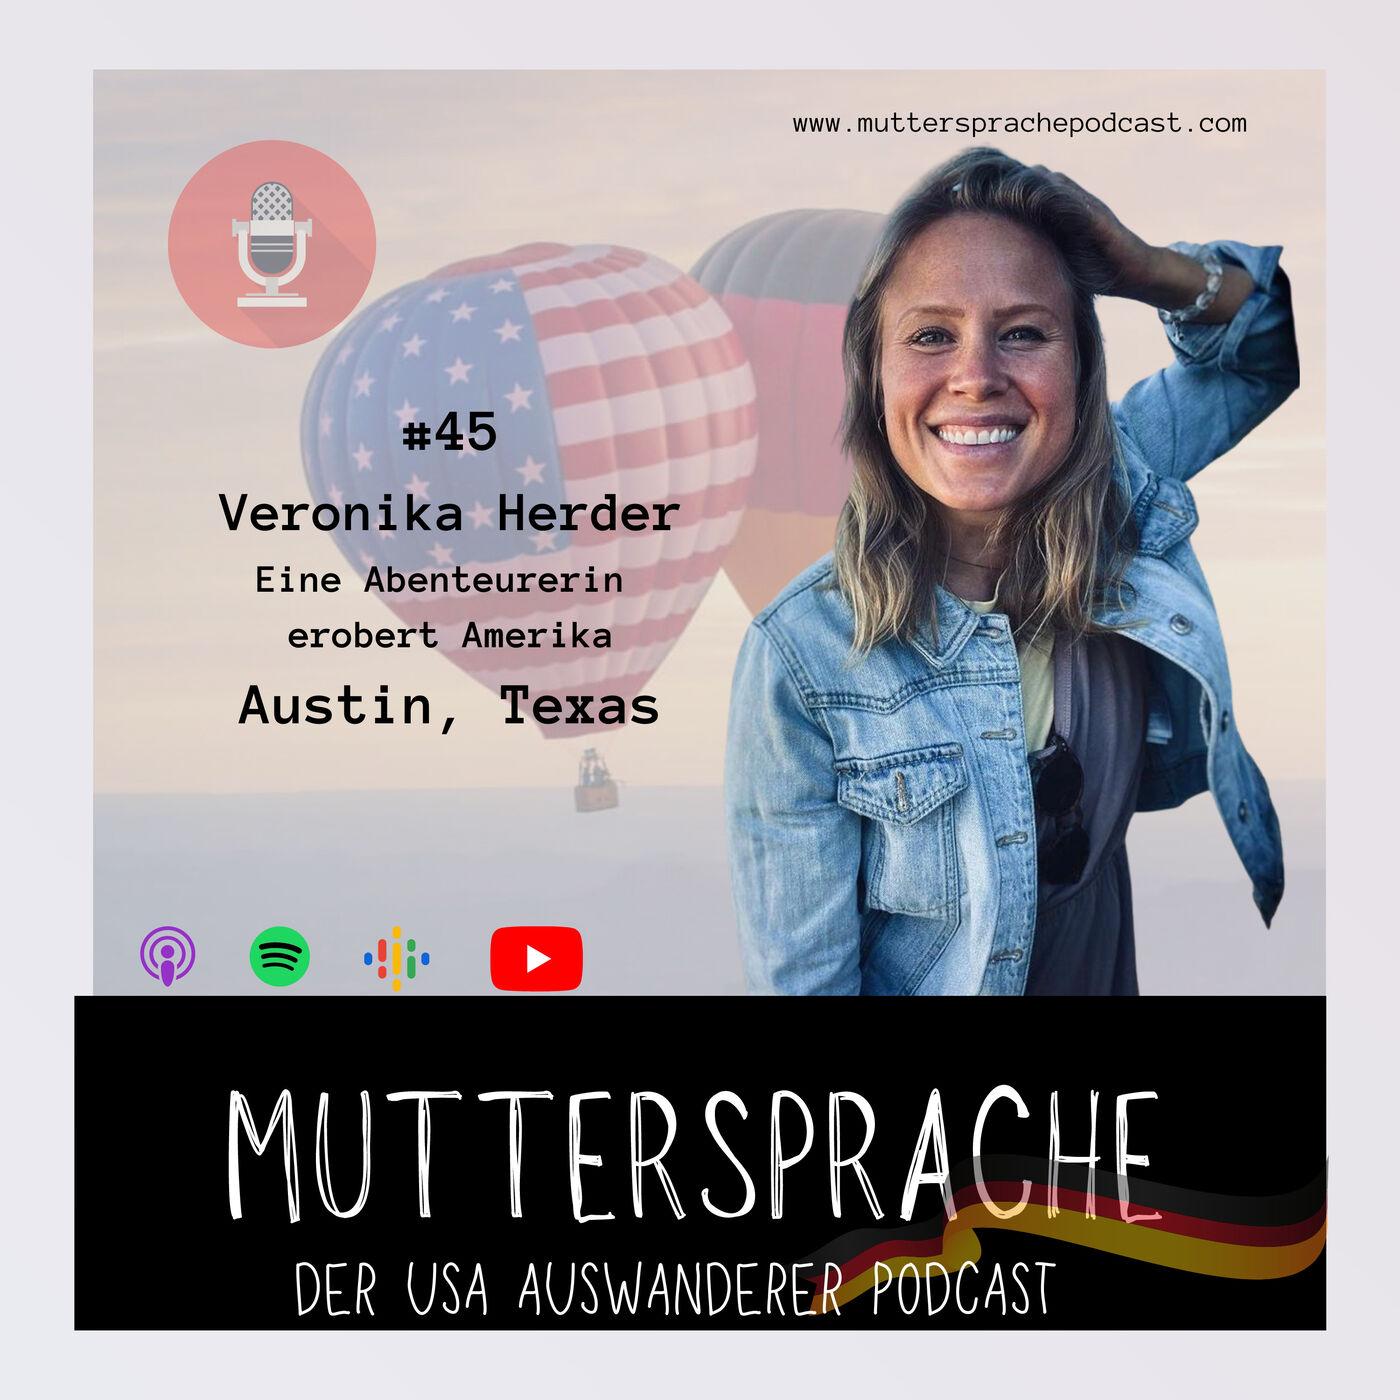 Folge 45: Eine Abenteurerin erobert Amerika - VERONIKA HERDER, Austin Texas